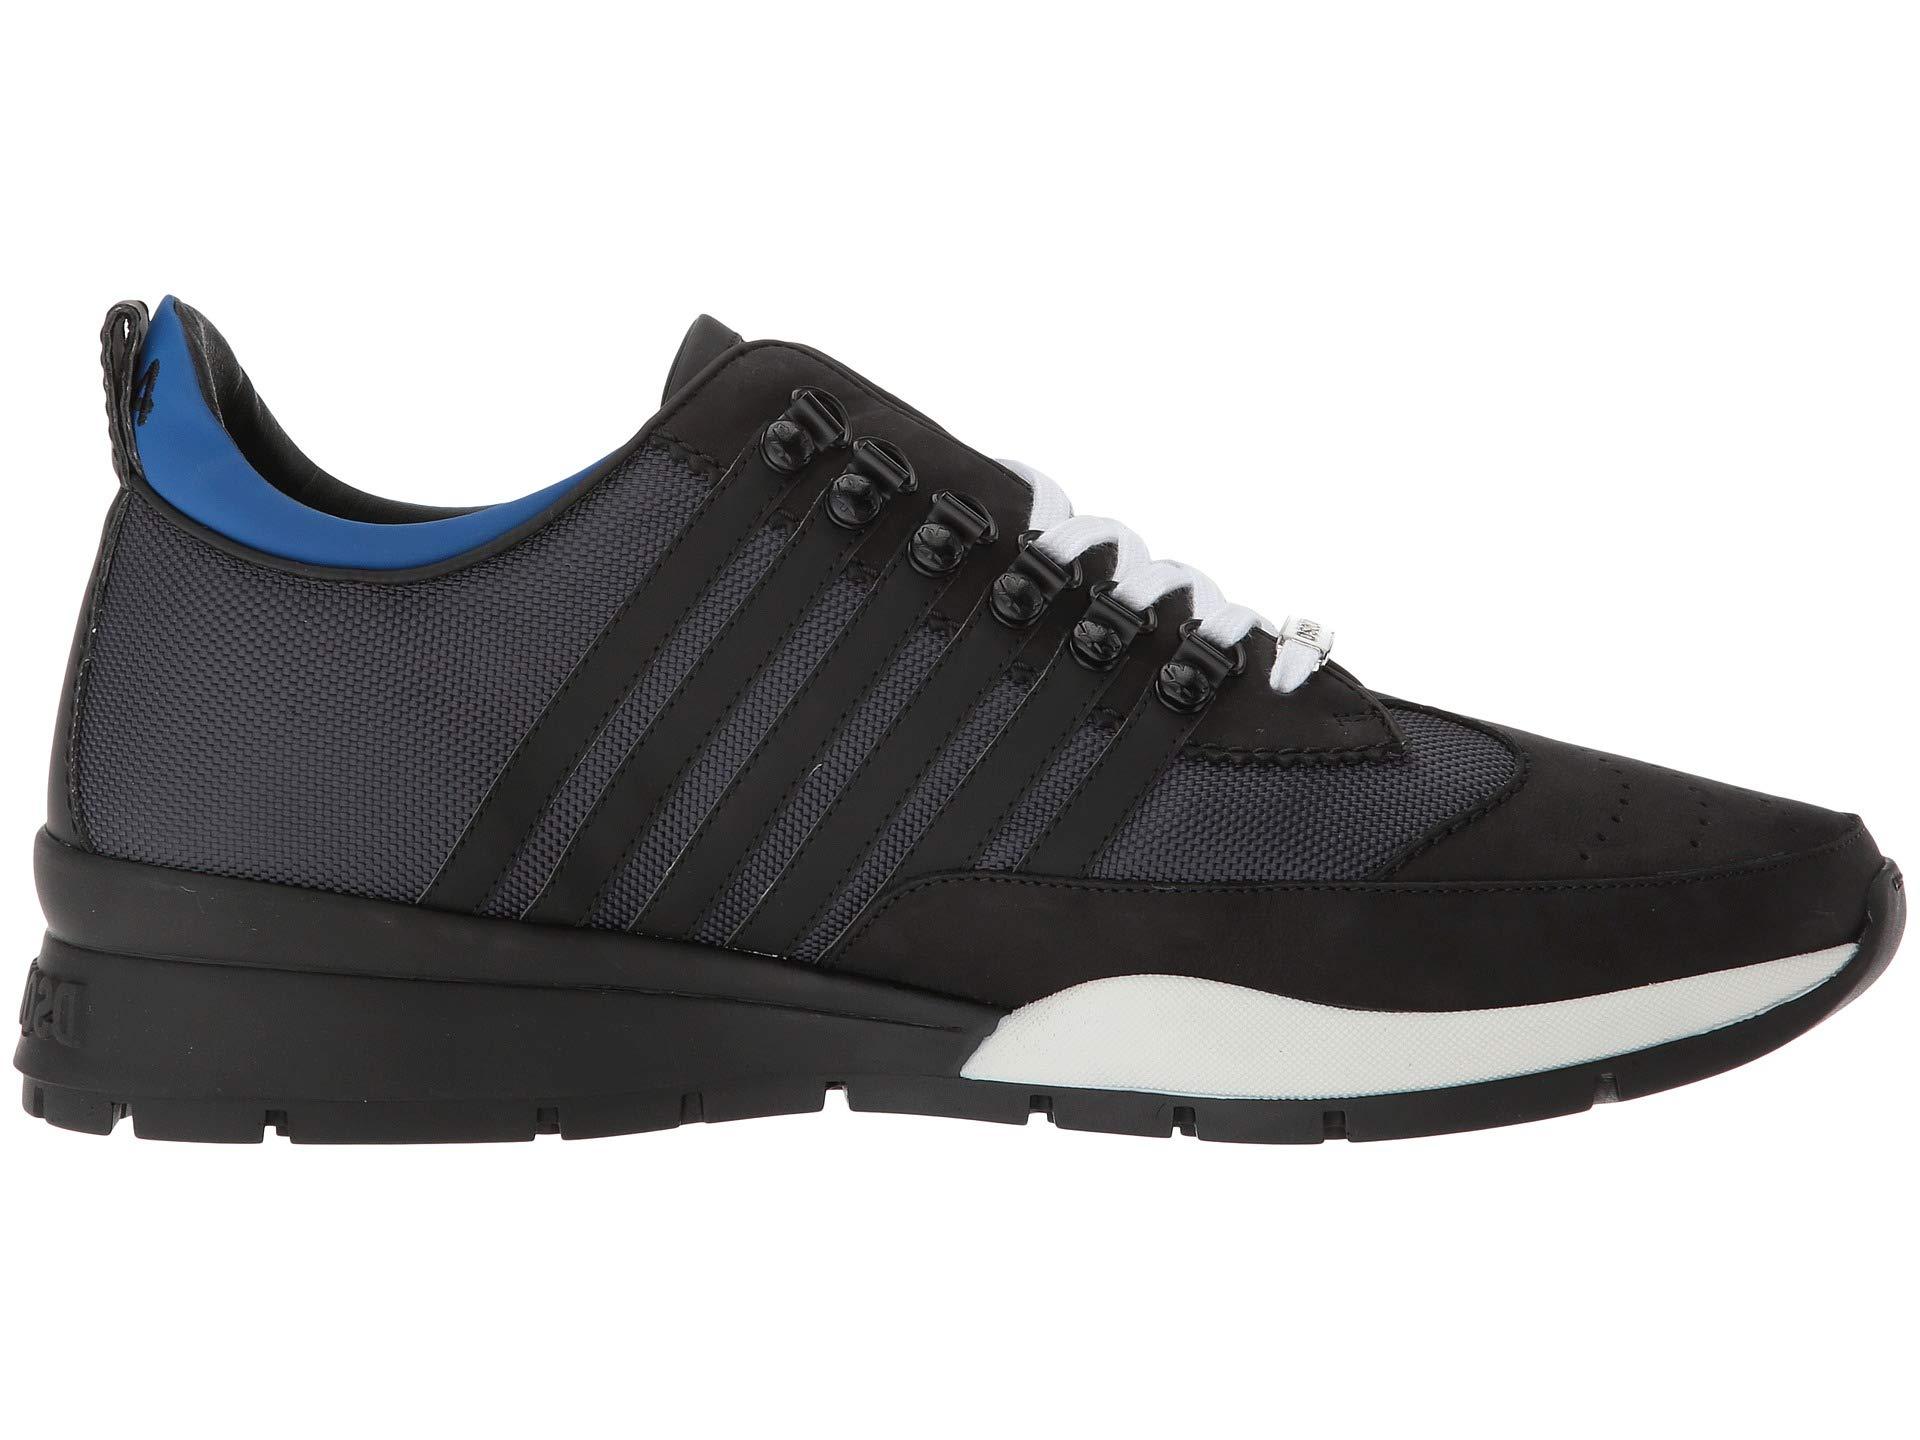 251 Dsquared2 Sneaker 251 Sneaker Grey black Grey Dsquared2 HqpPIwBxq